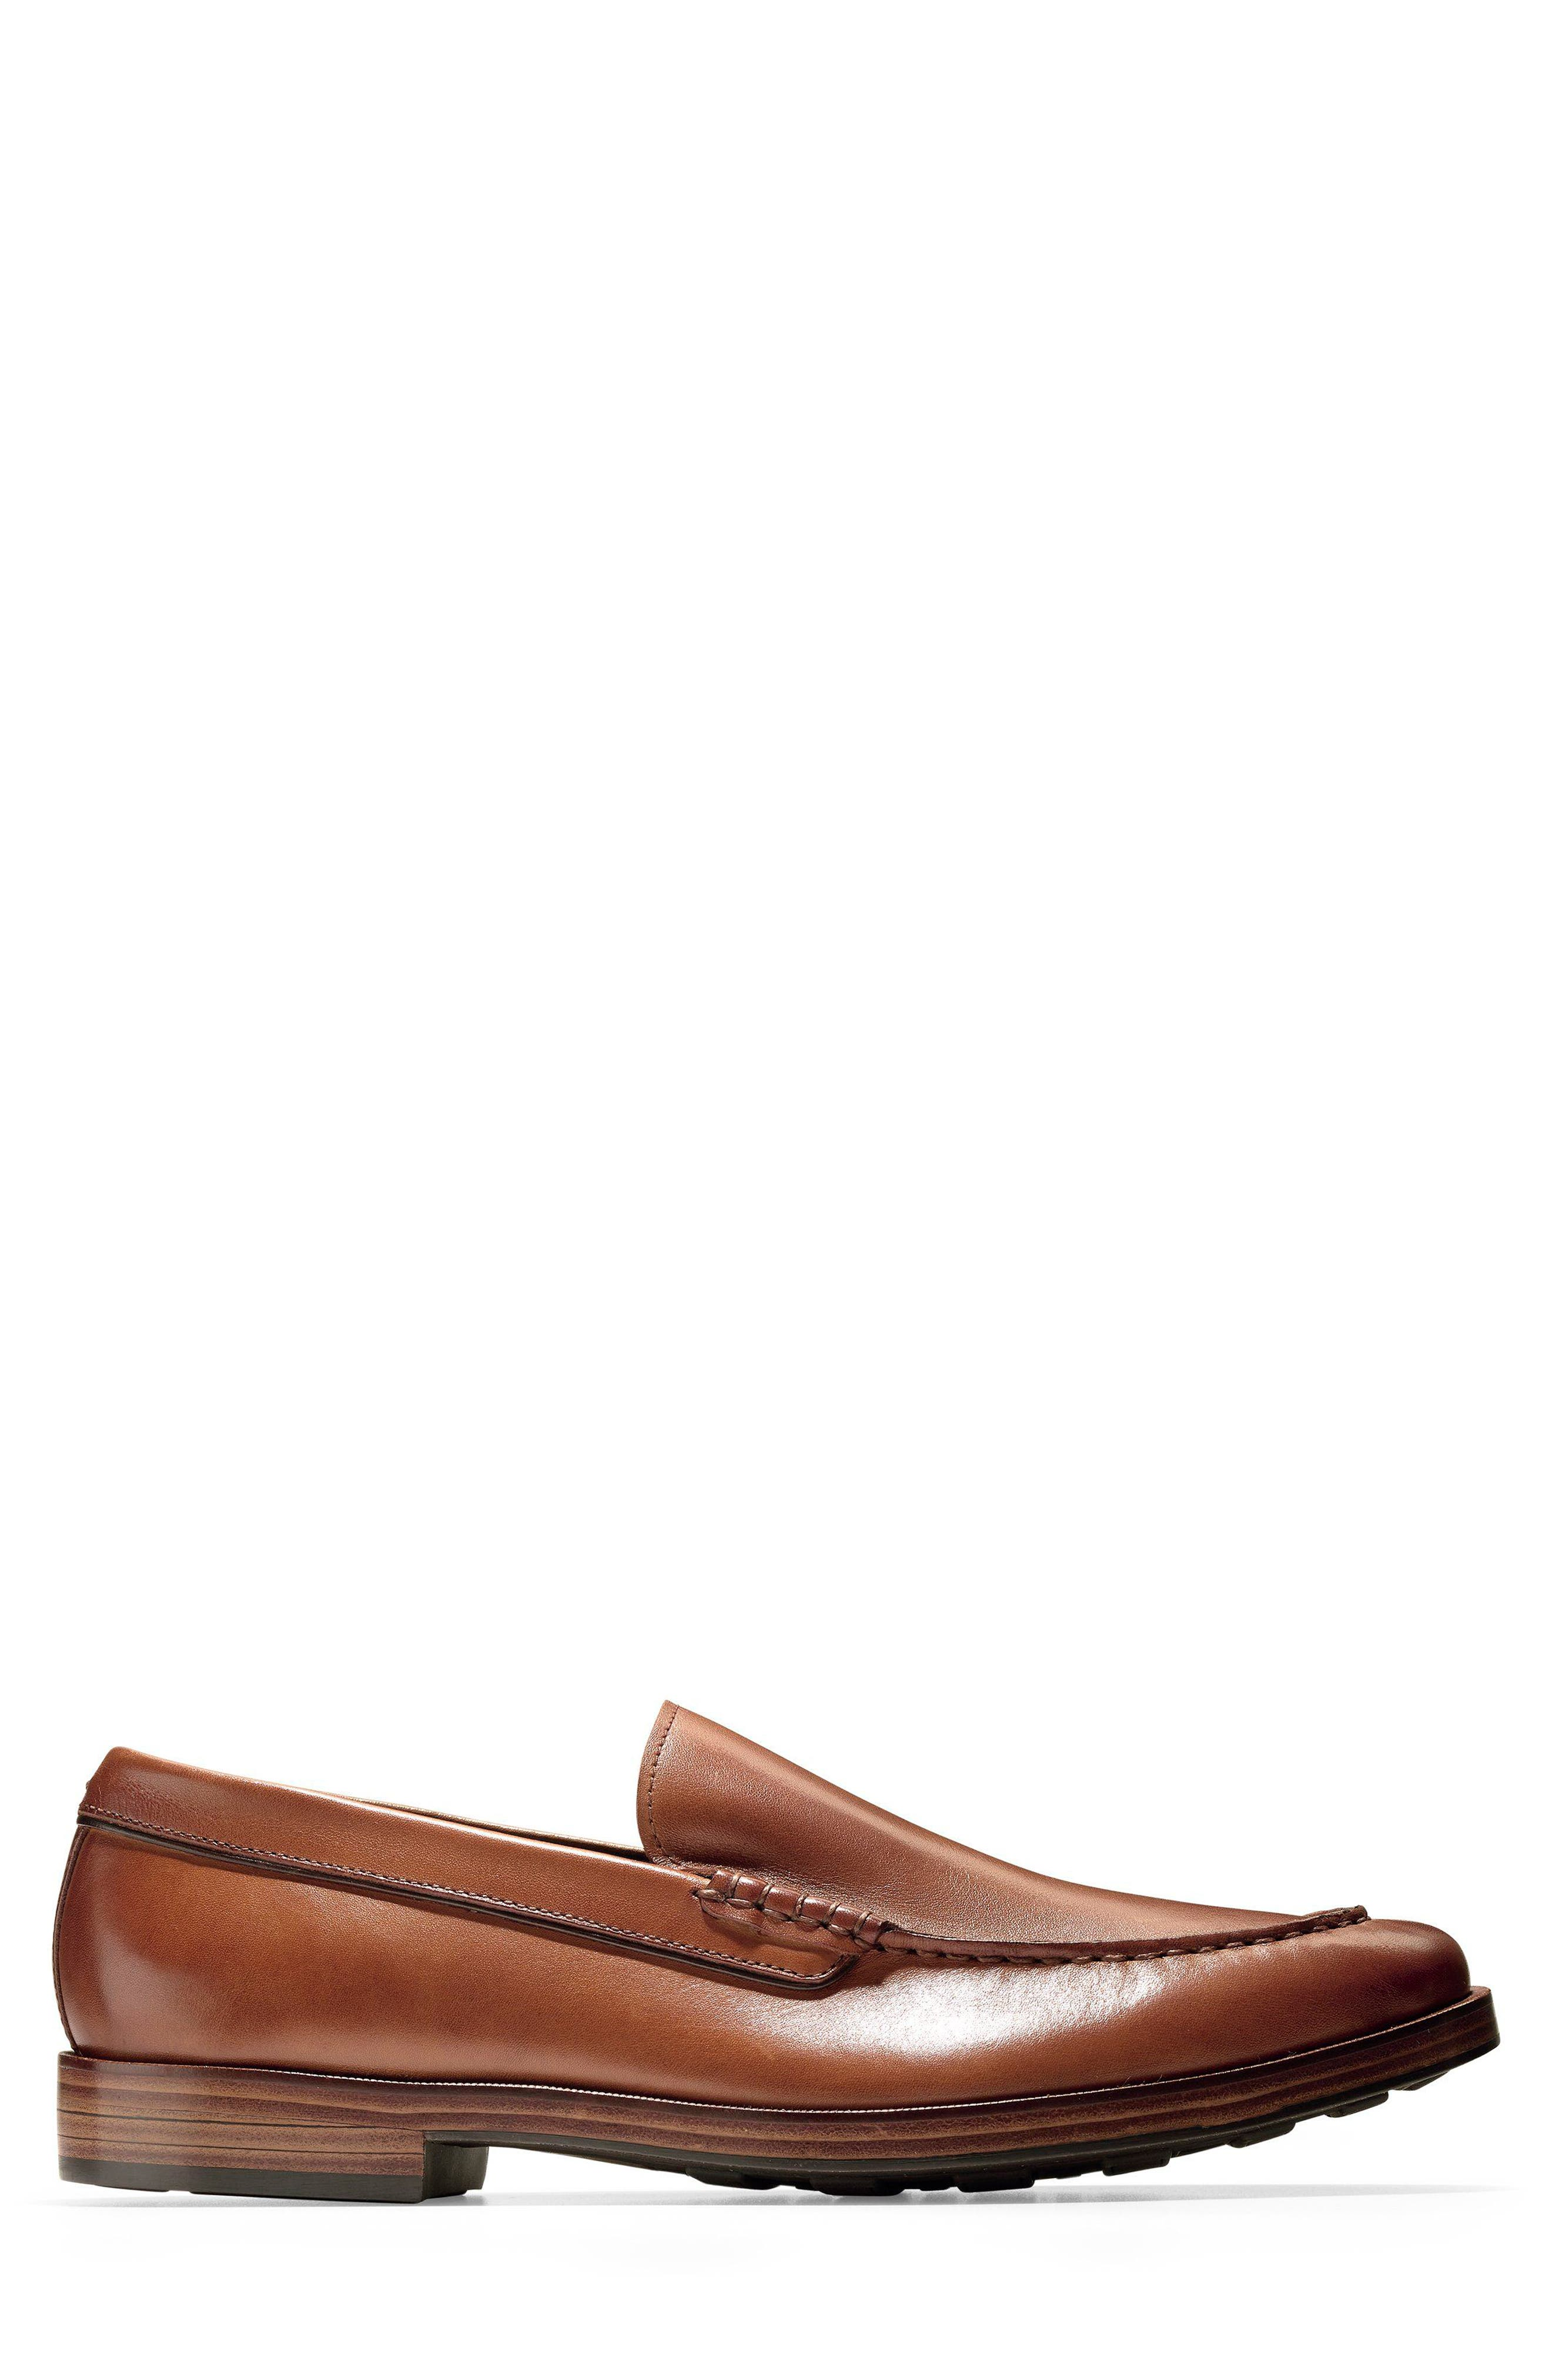 Hamilton Grand Venetian Loafer,                             Alternate thumbnail 3, color,                             British Tan